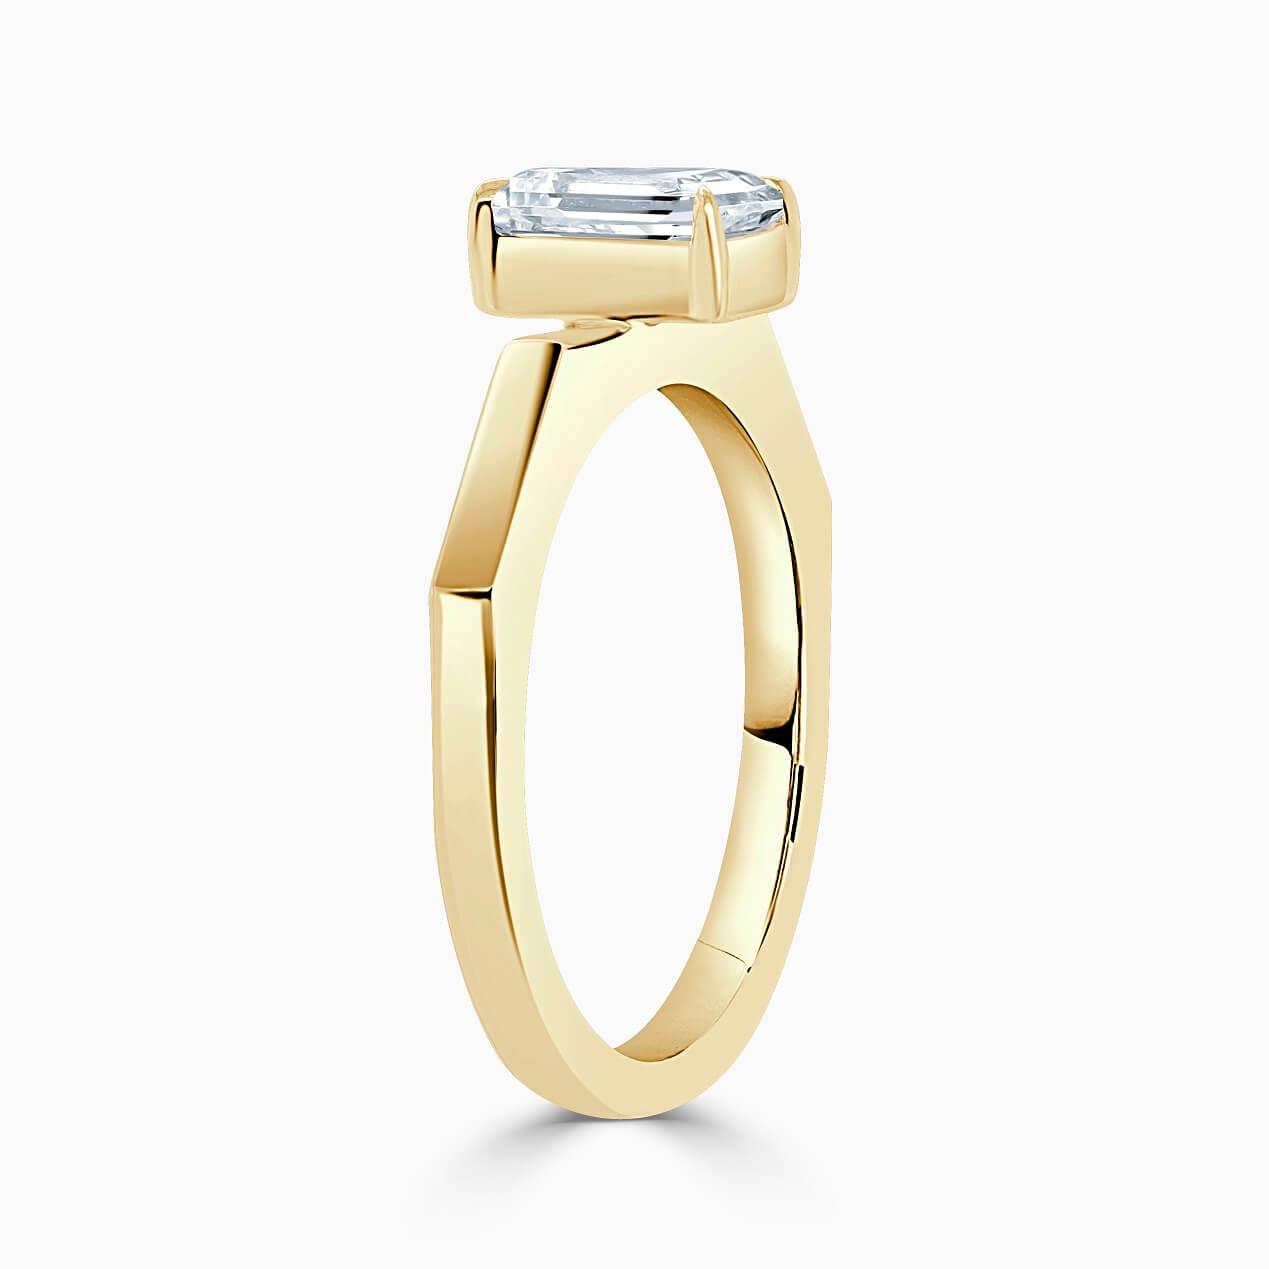 18ct Yellow Gold Emerald Cut Geometric Engagement Ring